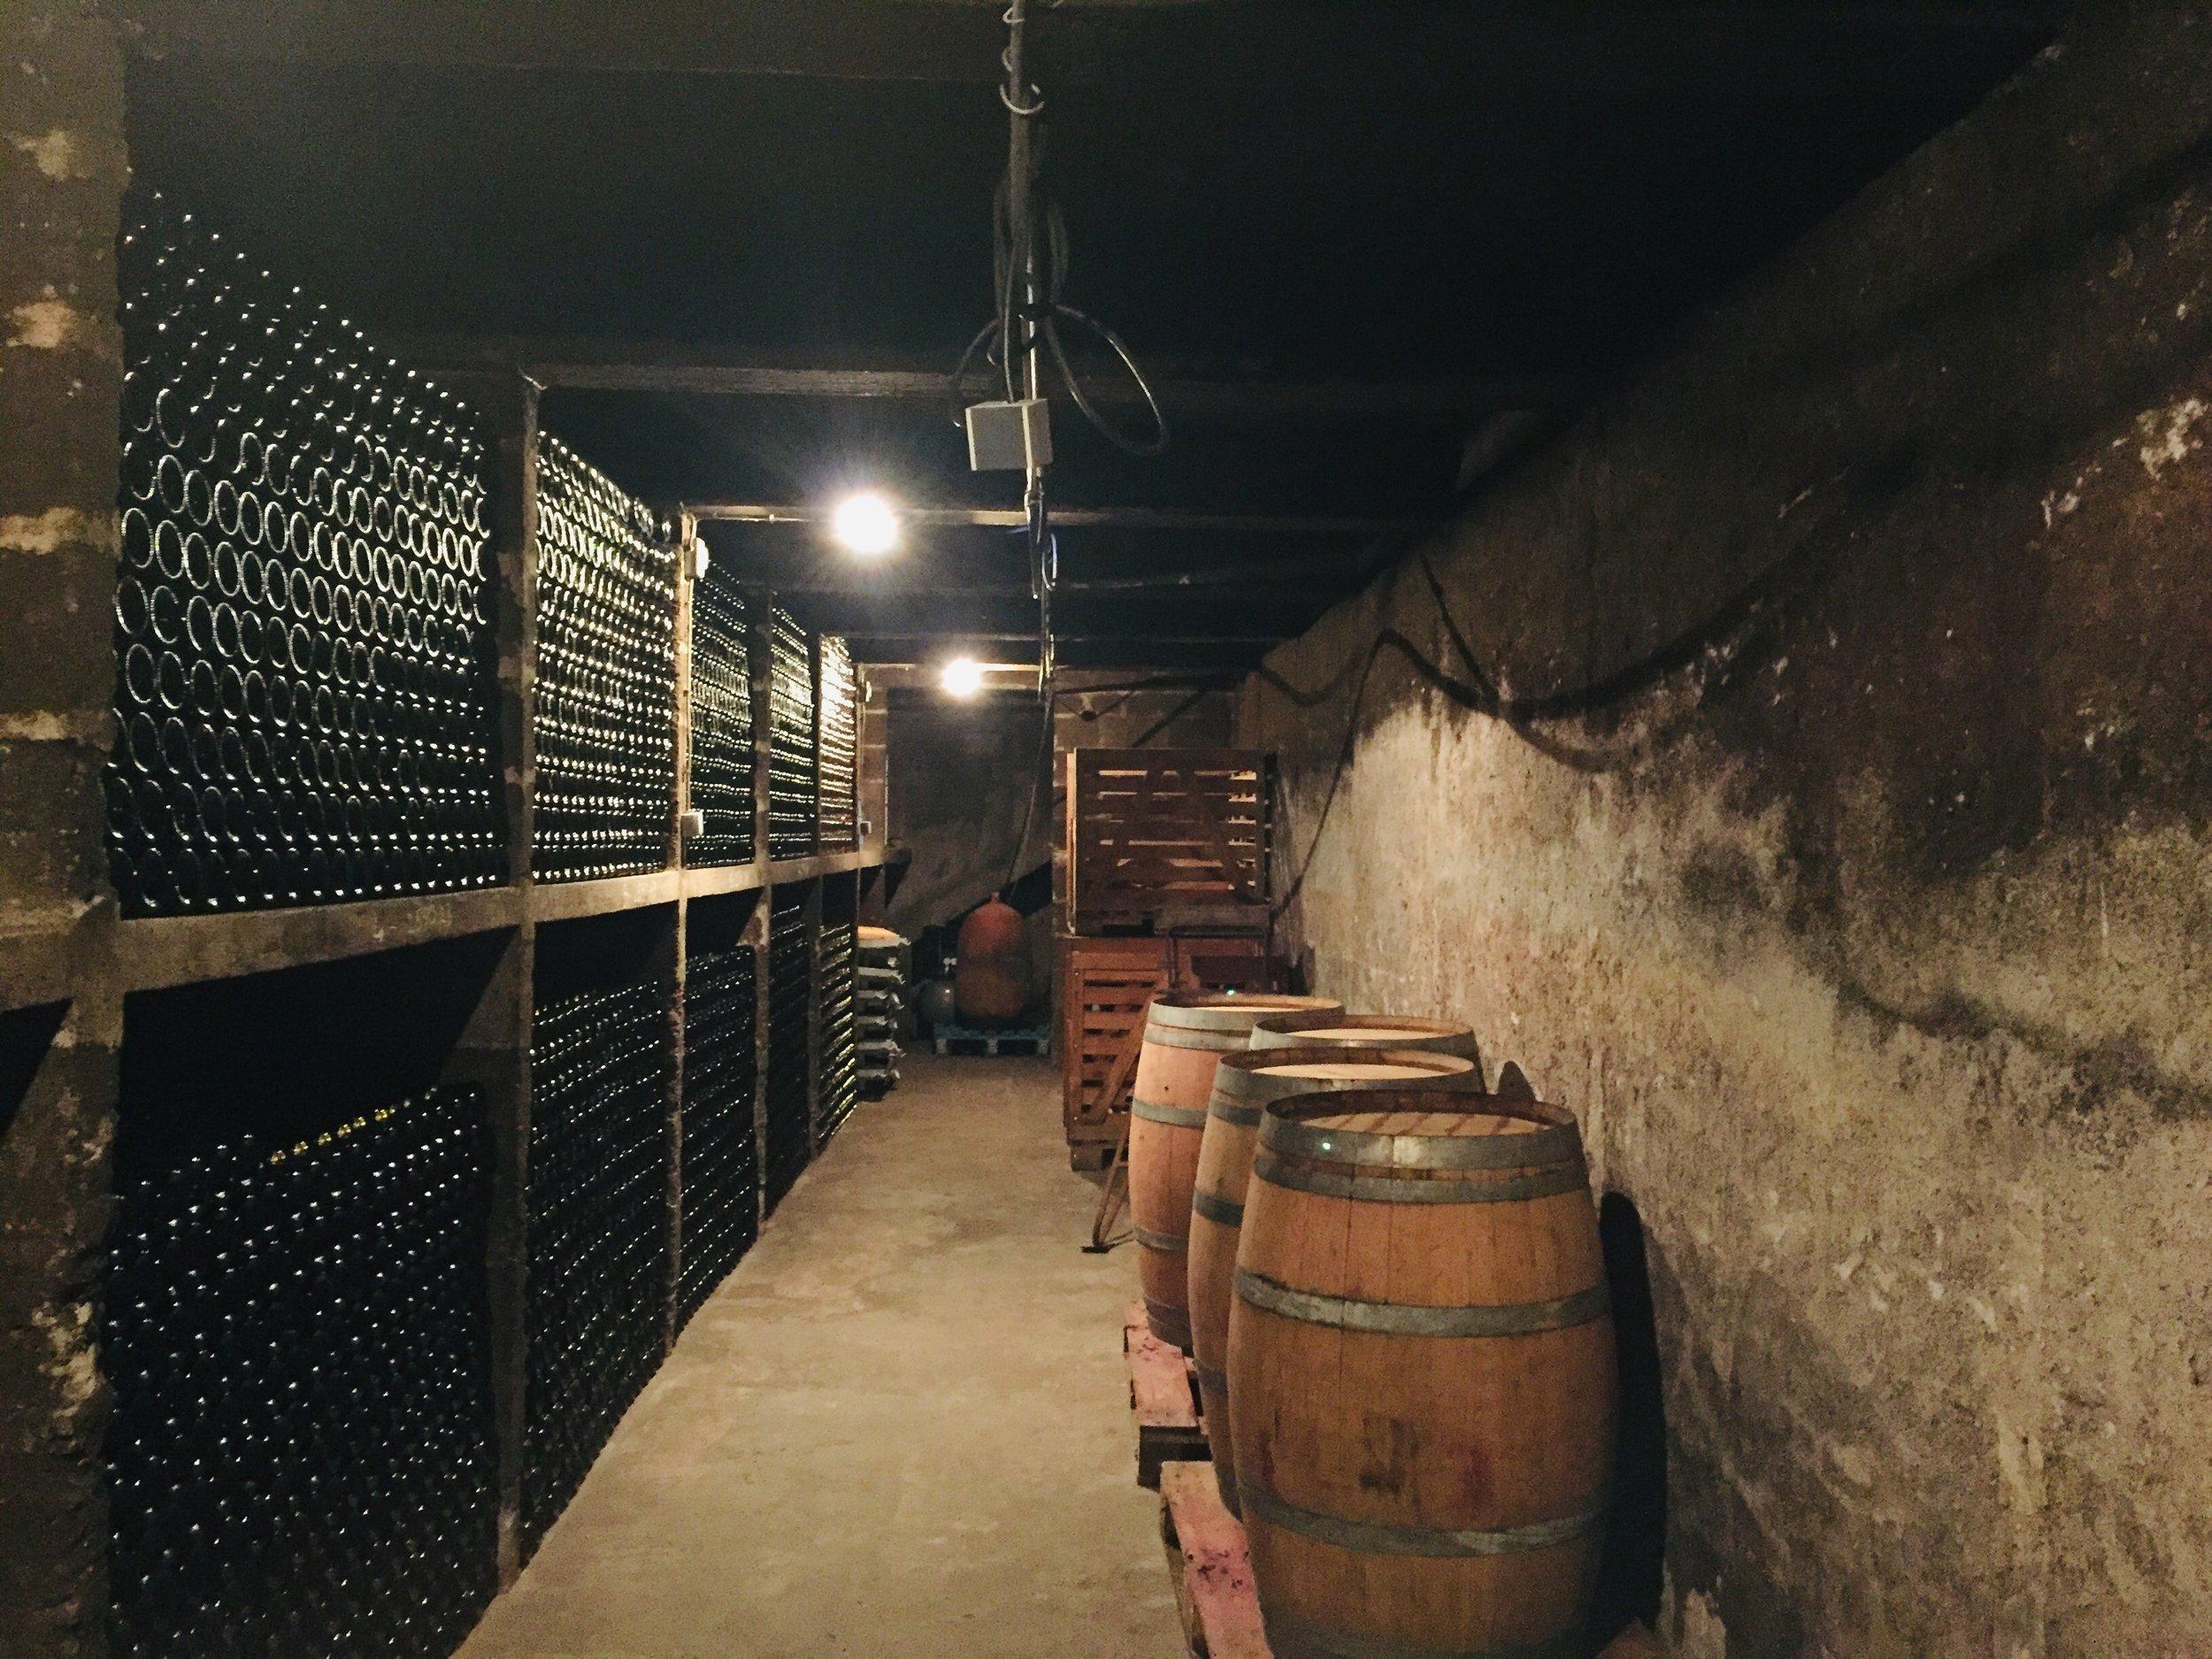 The Domaine's cellar